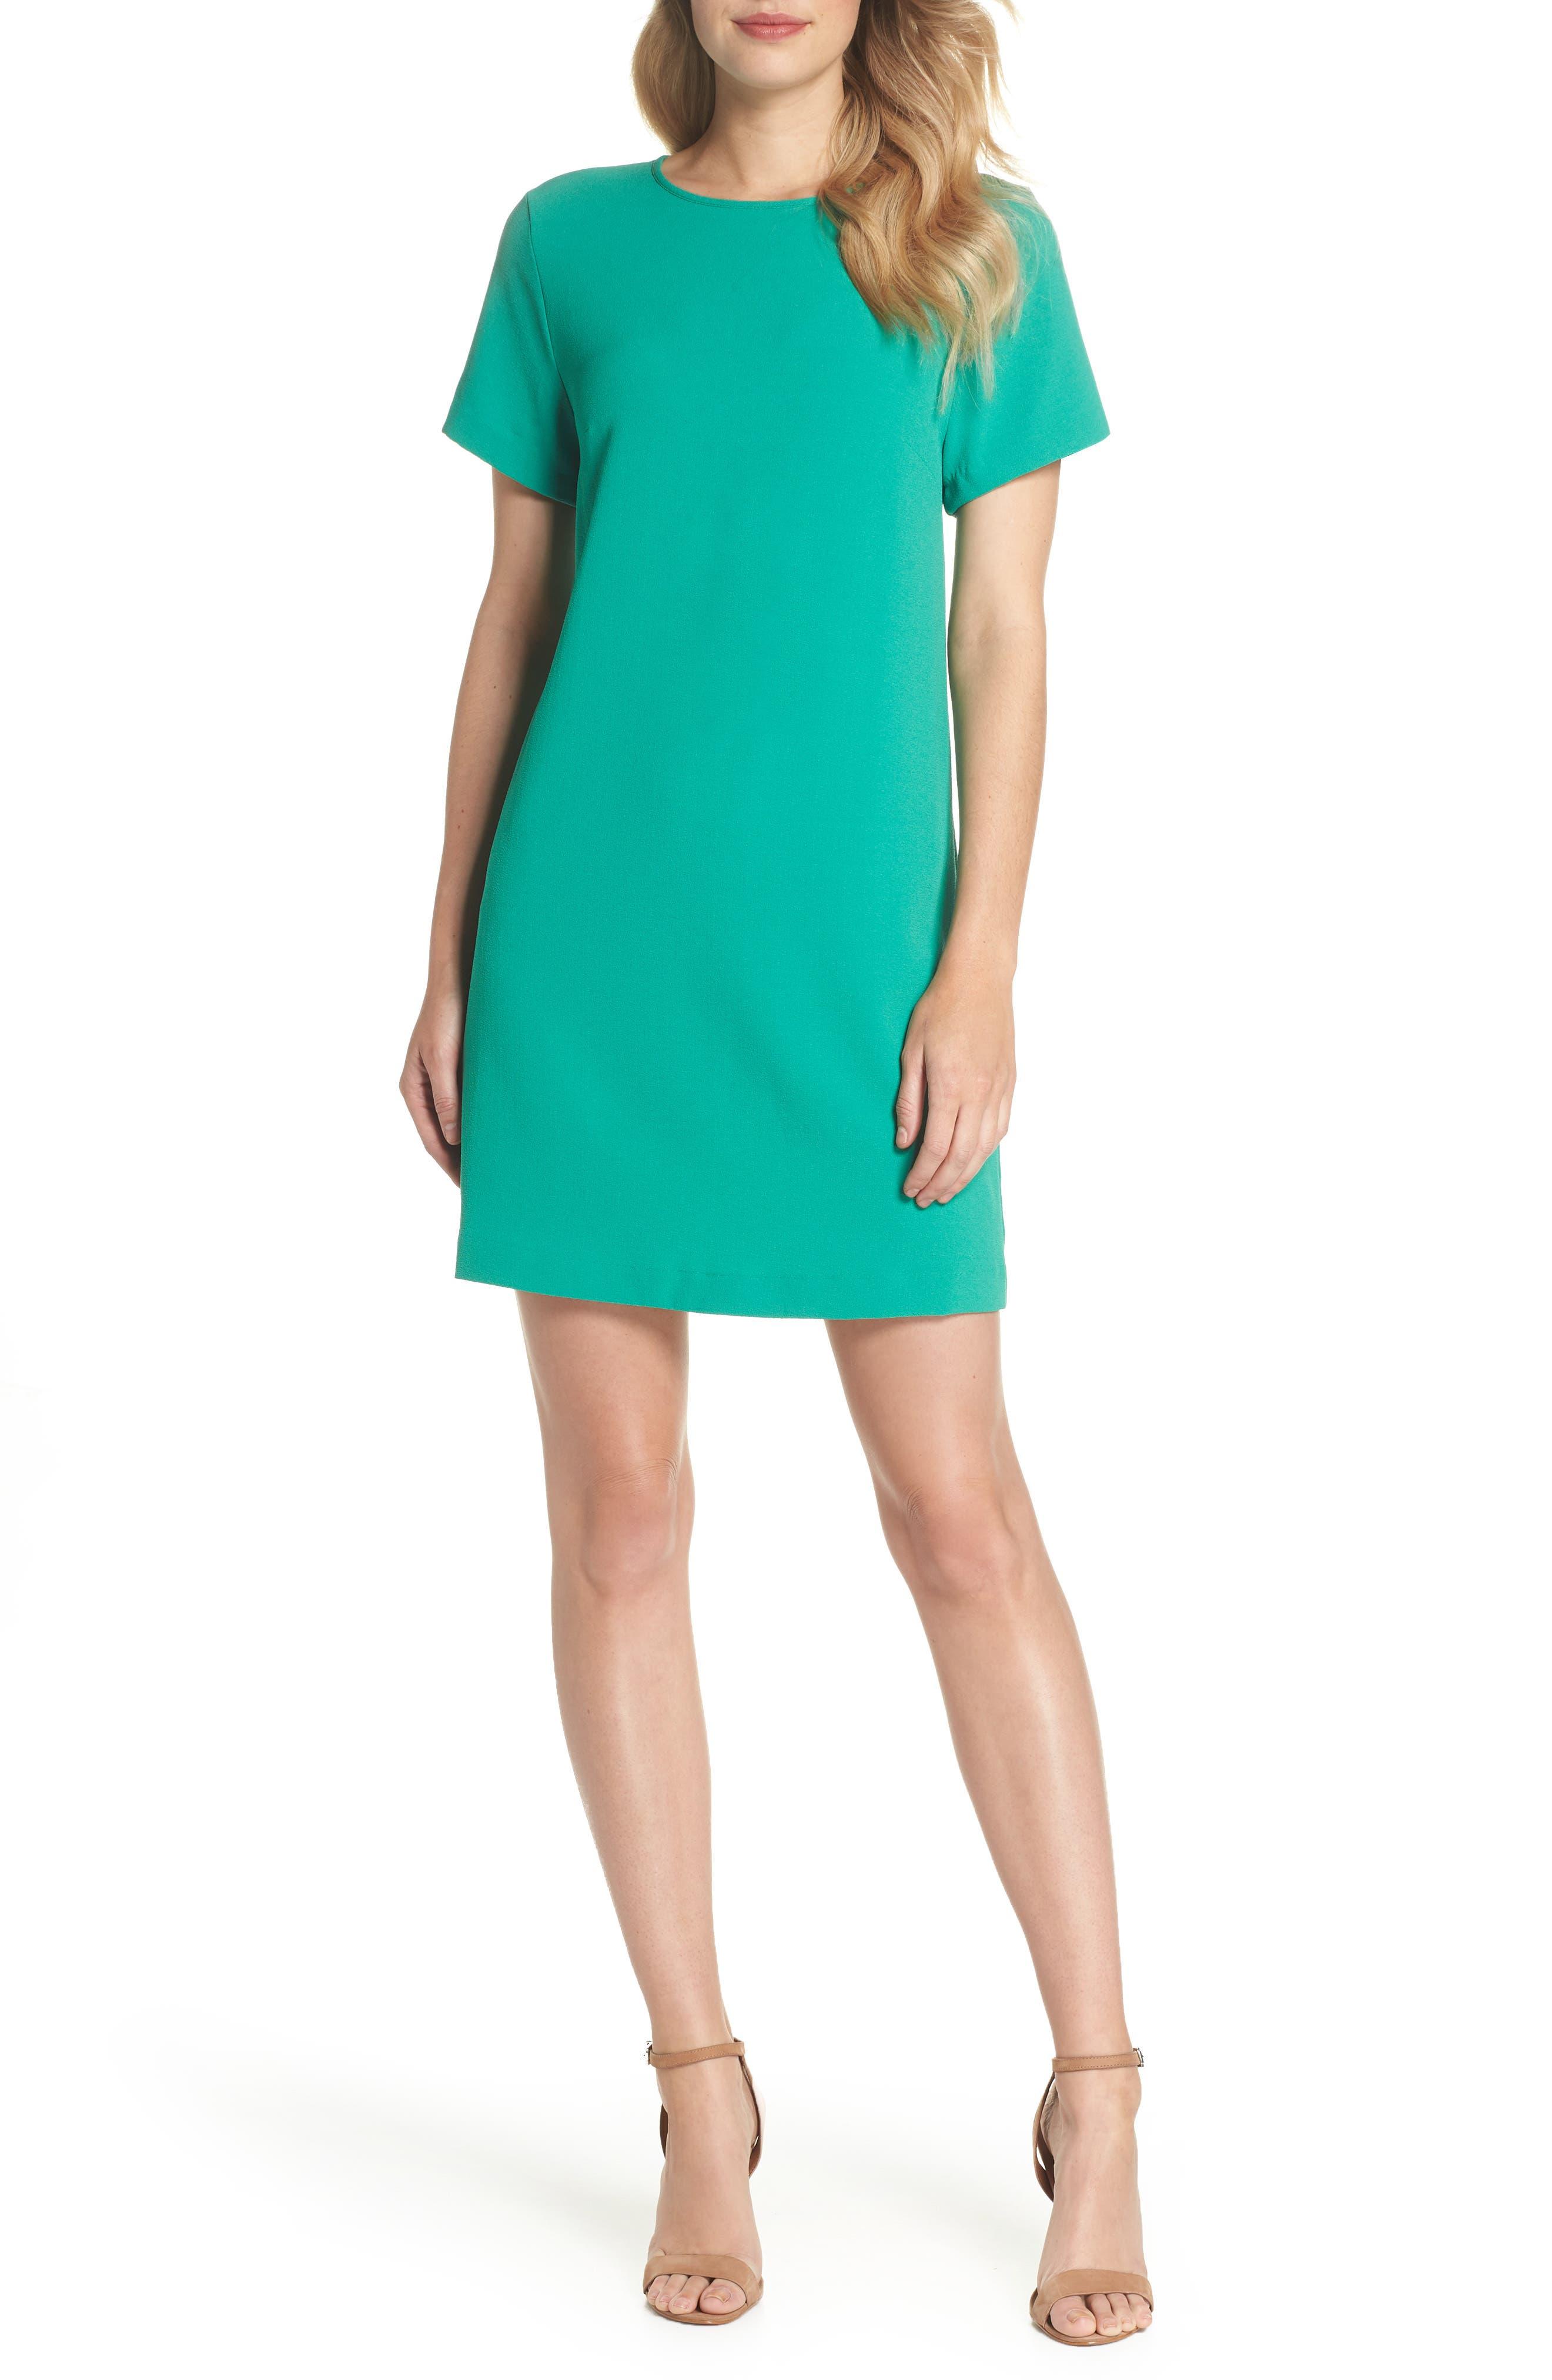 Devery Crepe Shift Dress,                             Alternate thumbnail 2, color,                             EMERALD GREEN